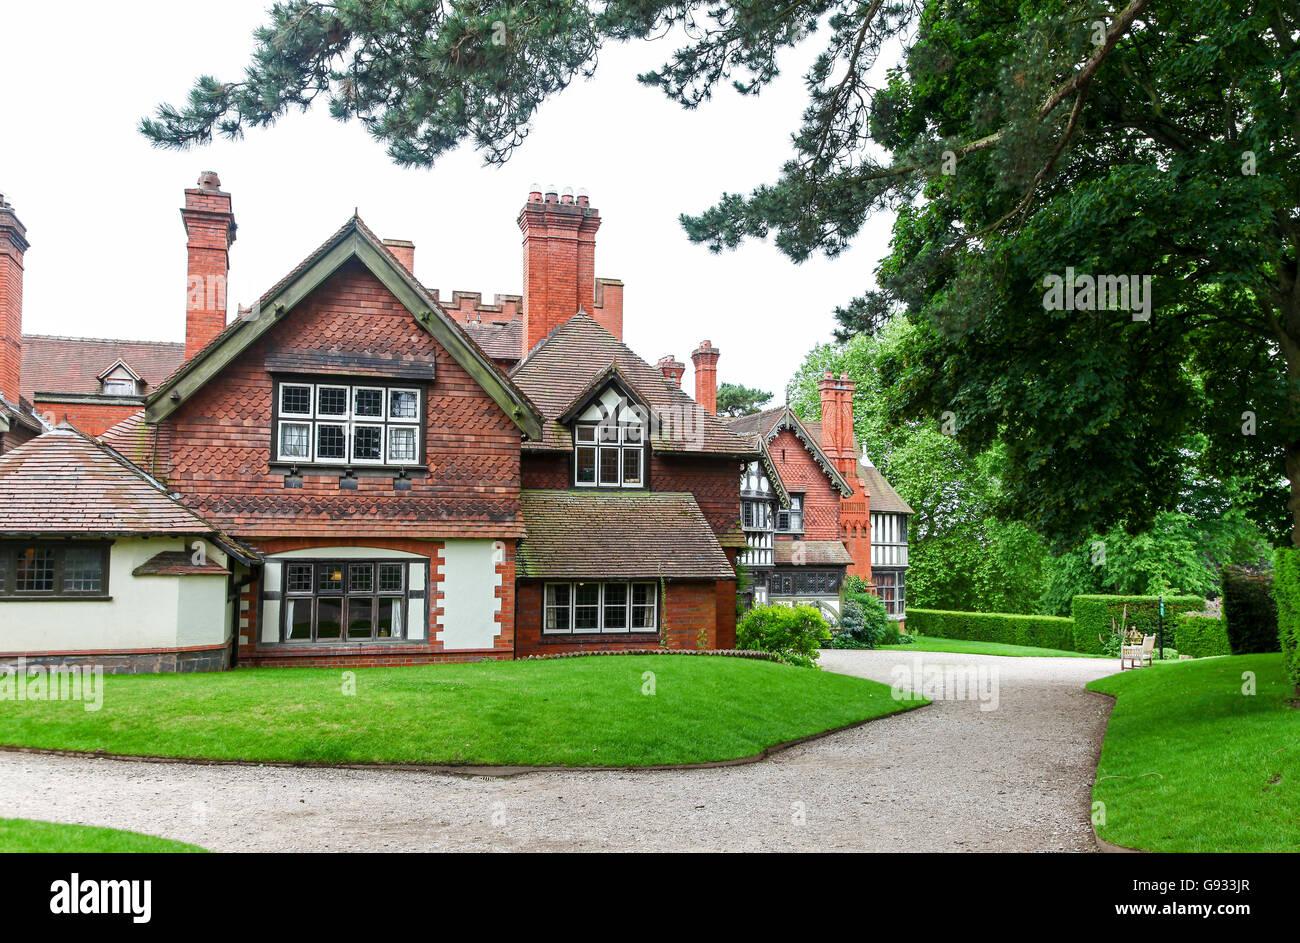 Wightwick Manor  Wolverhampton West Midlands England UK - Stock Image